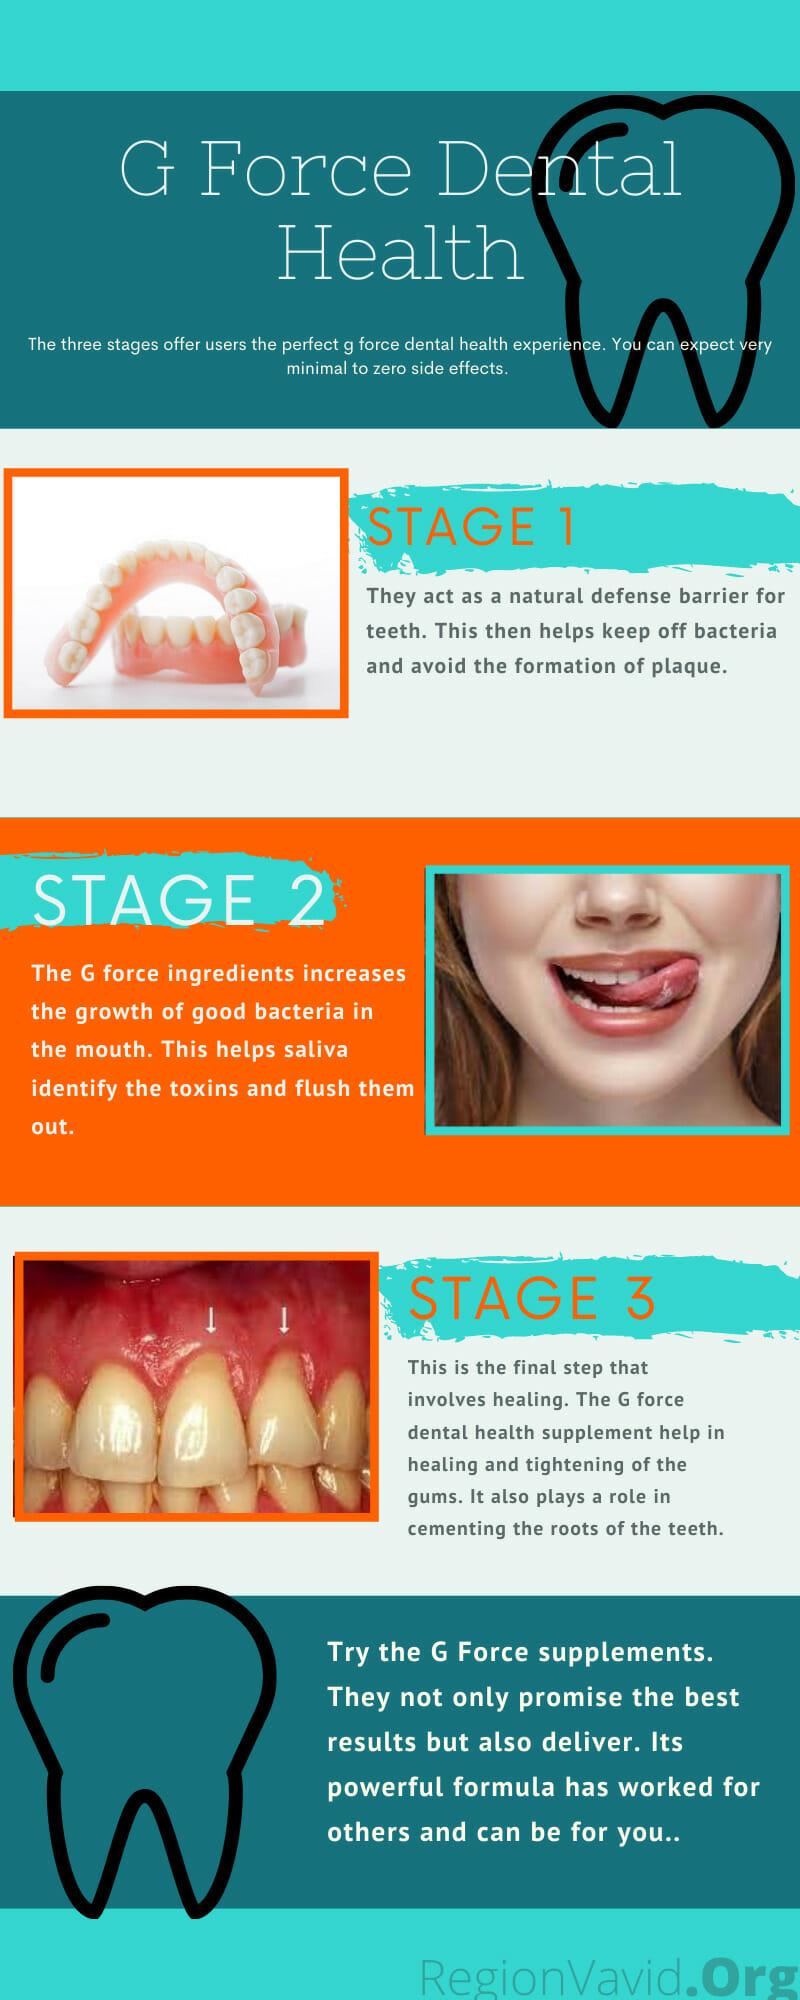 GForce Dental Health Stage